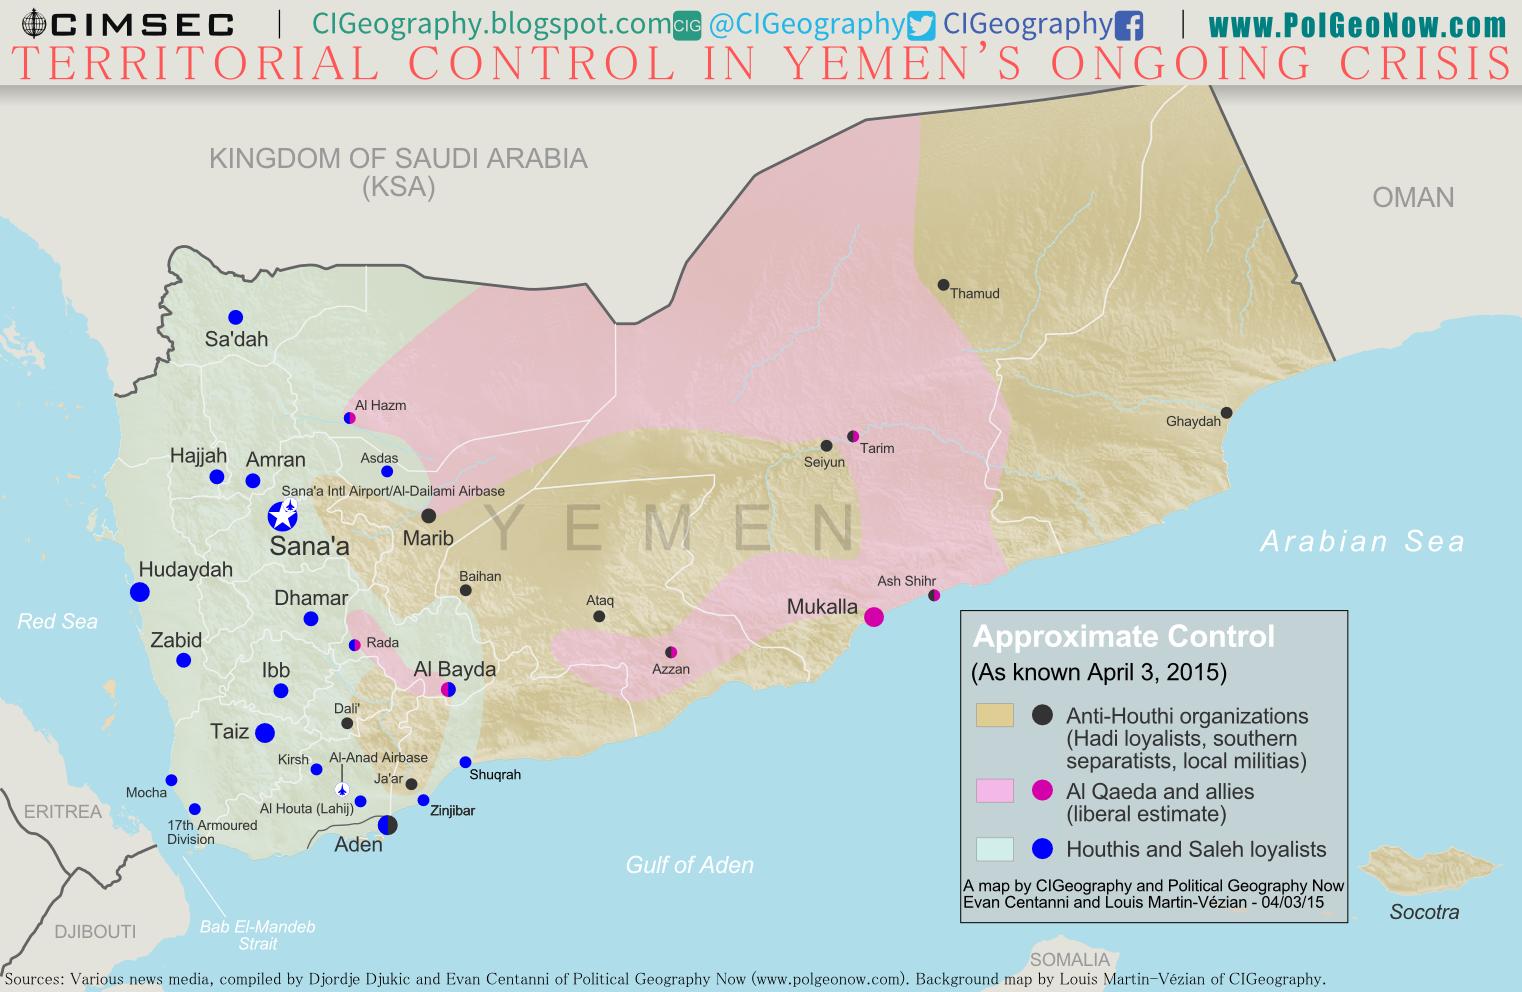 Political Map Of Yemen.War In Yemen Map Of Territorial Control April 2015 Political